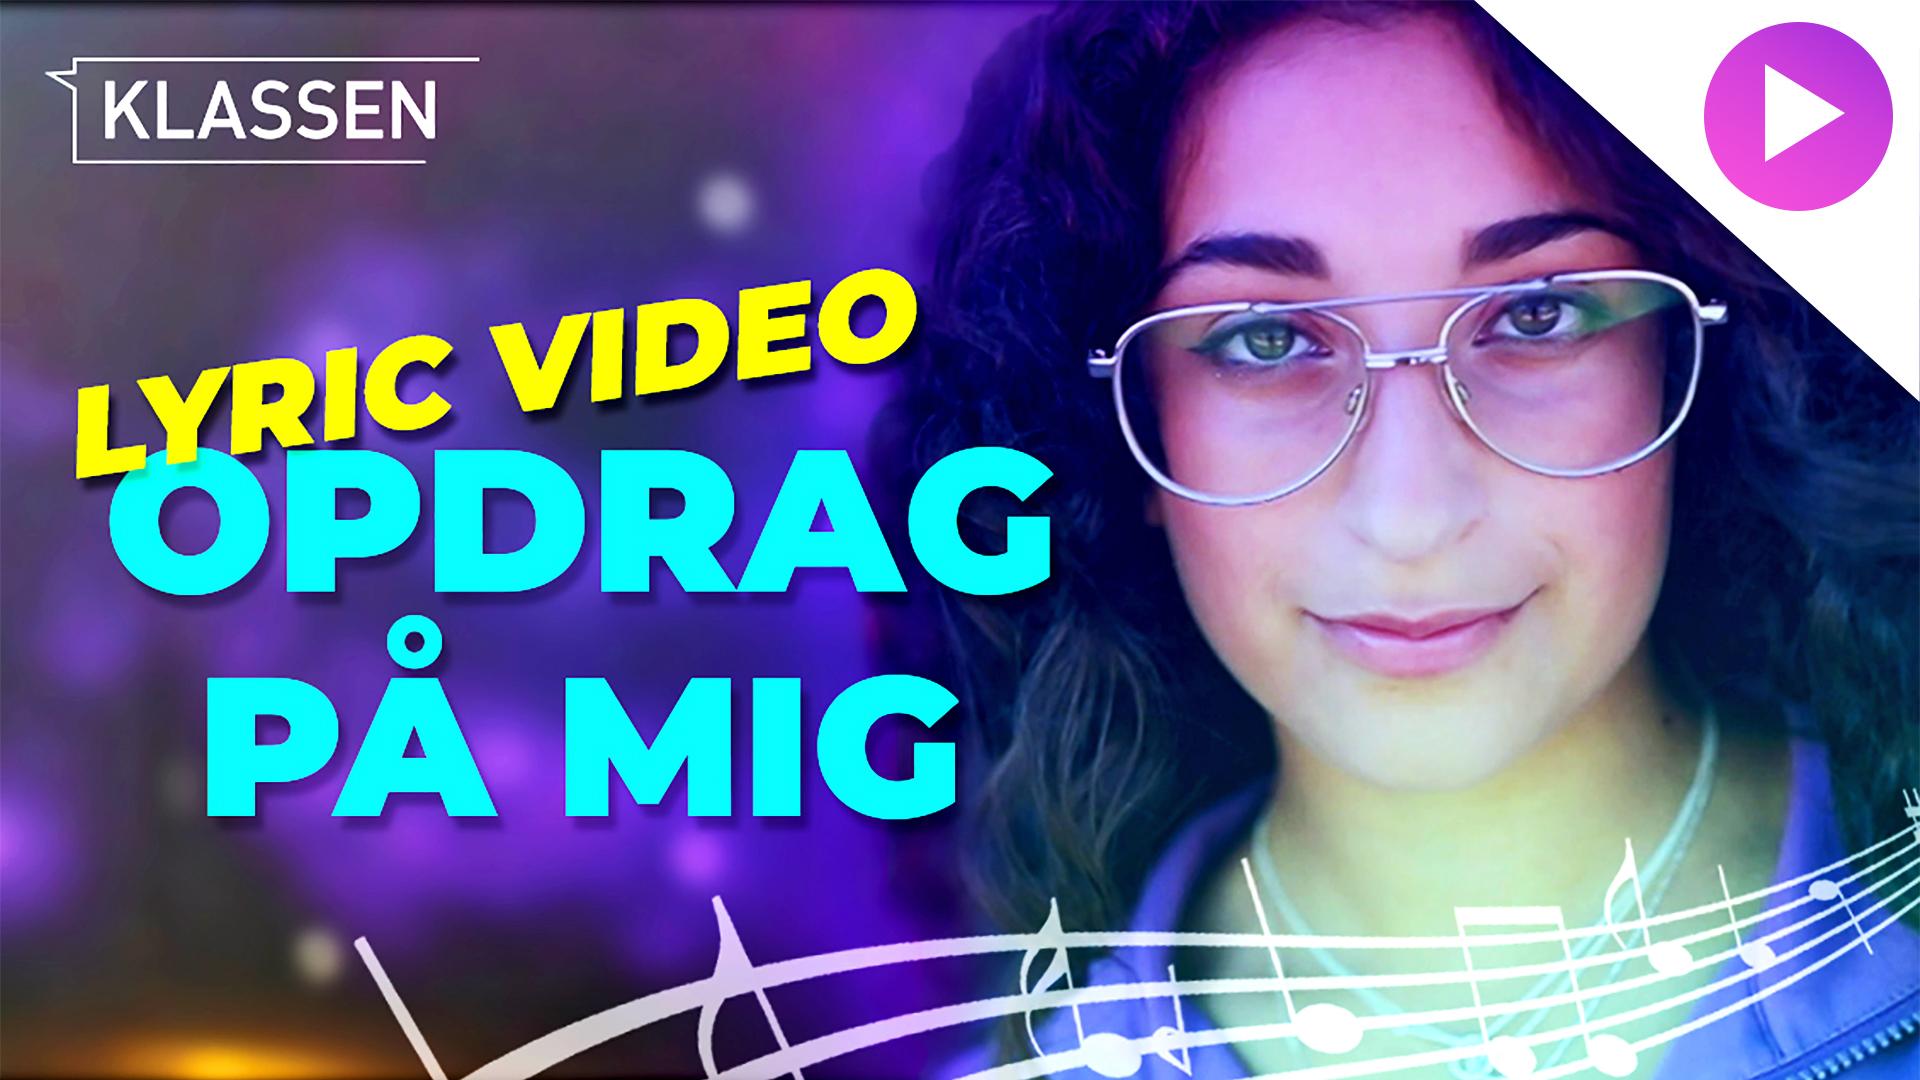 klassen_musikvideo_opdrag_paa_mig_lyric_video_drupal.jpg